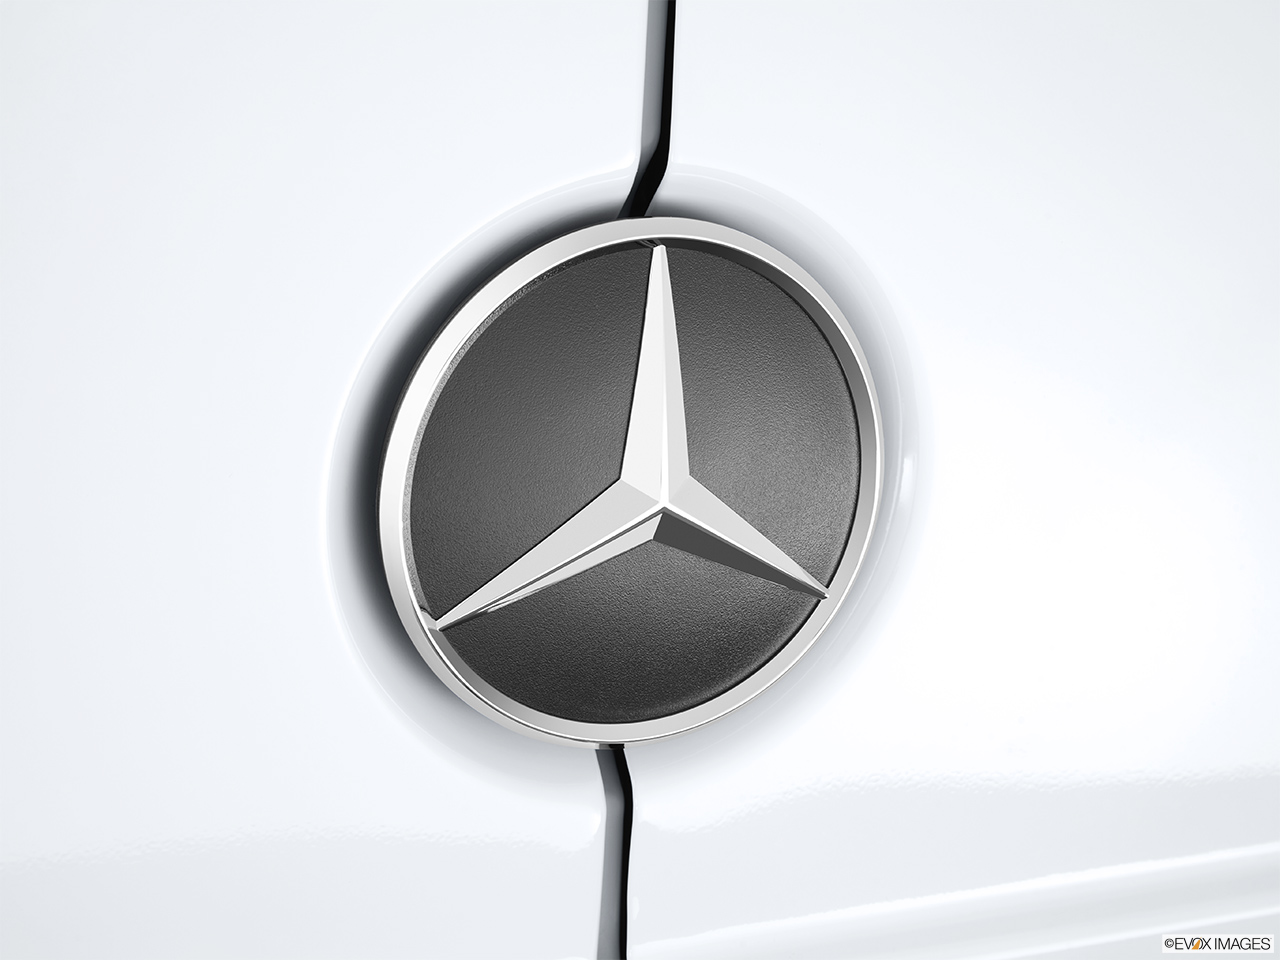 Cargo vans com autos post for Mercedes benz light up emblem